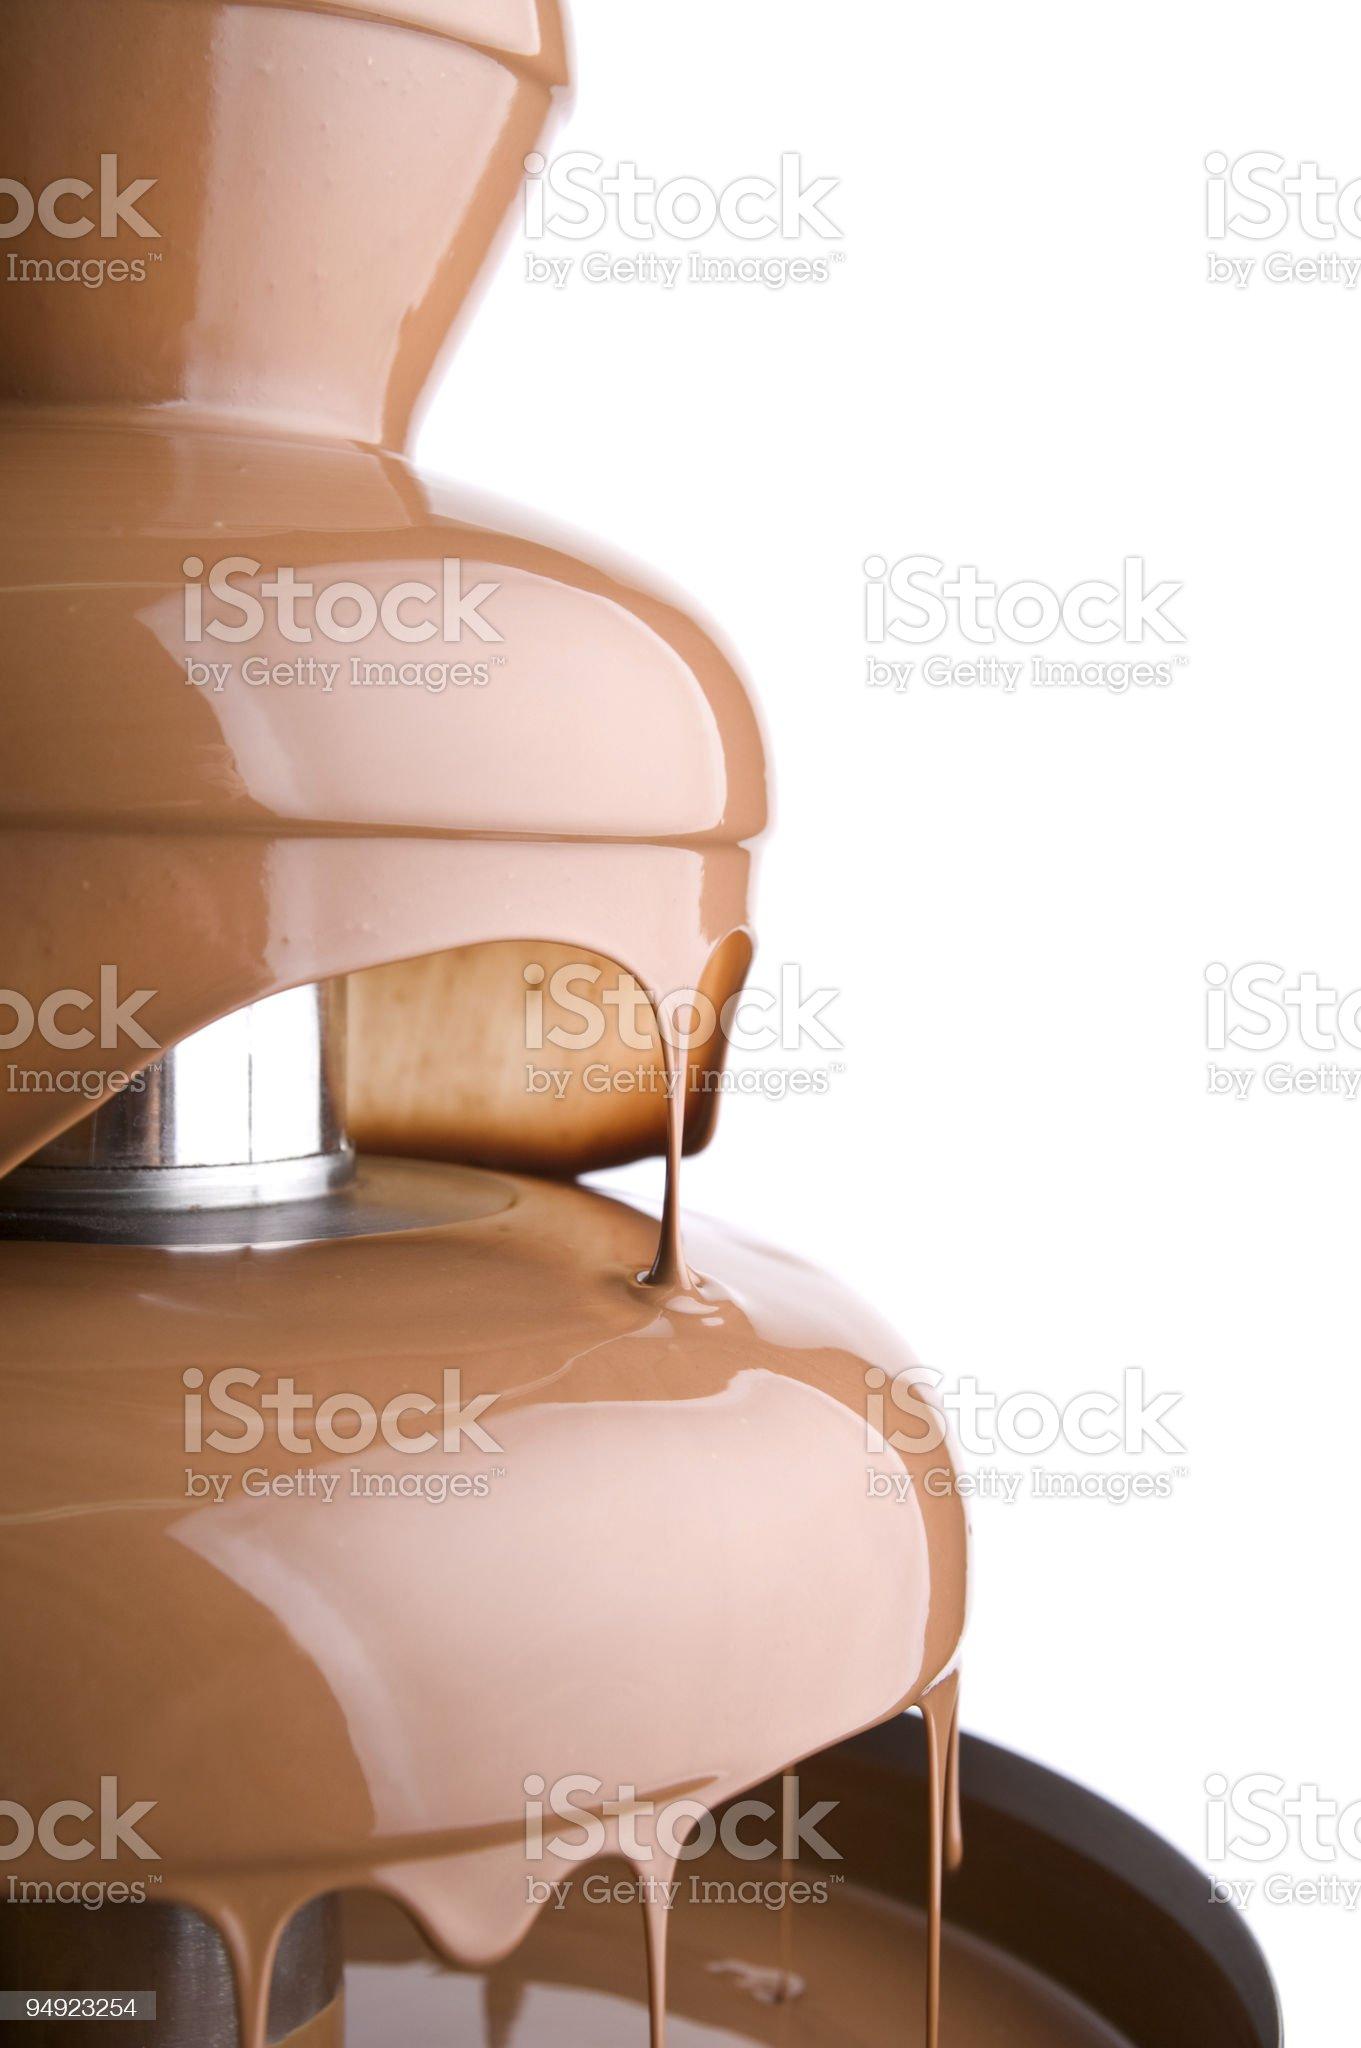 Chocolate fountain royalty-free stock photo